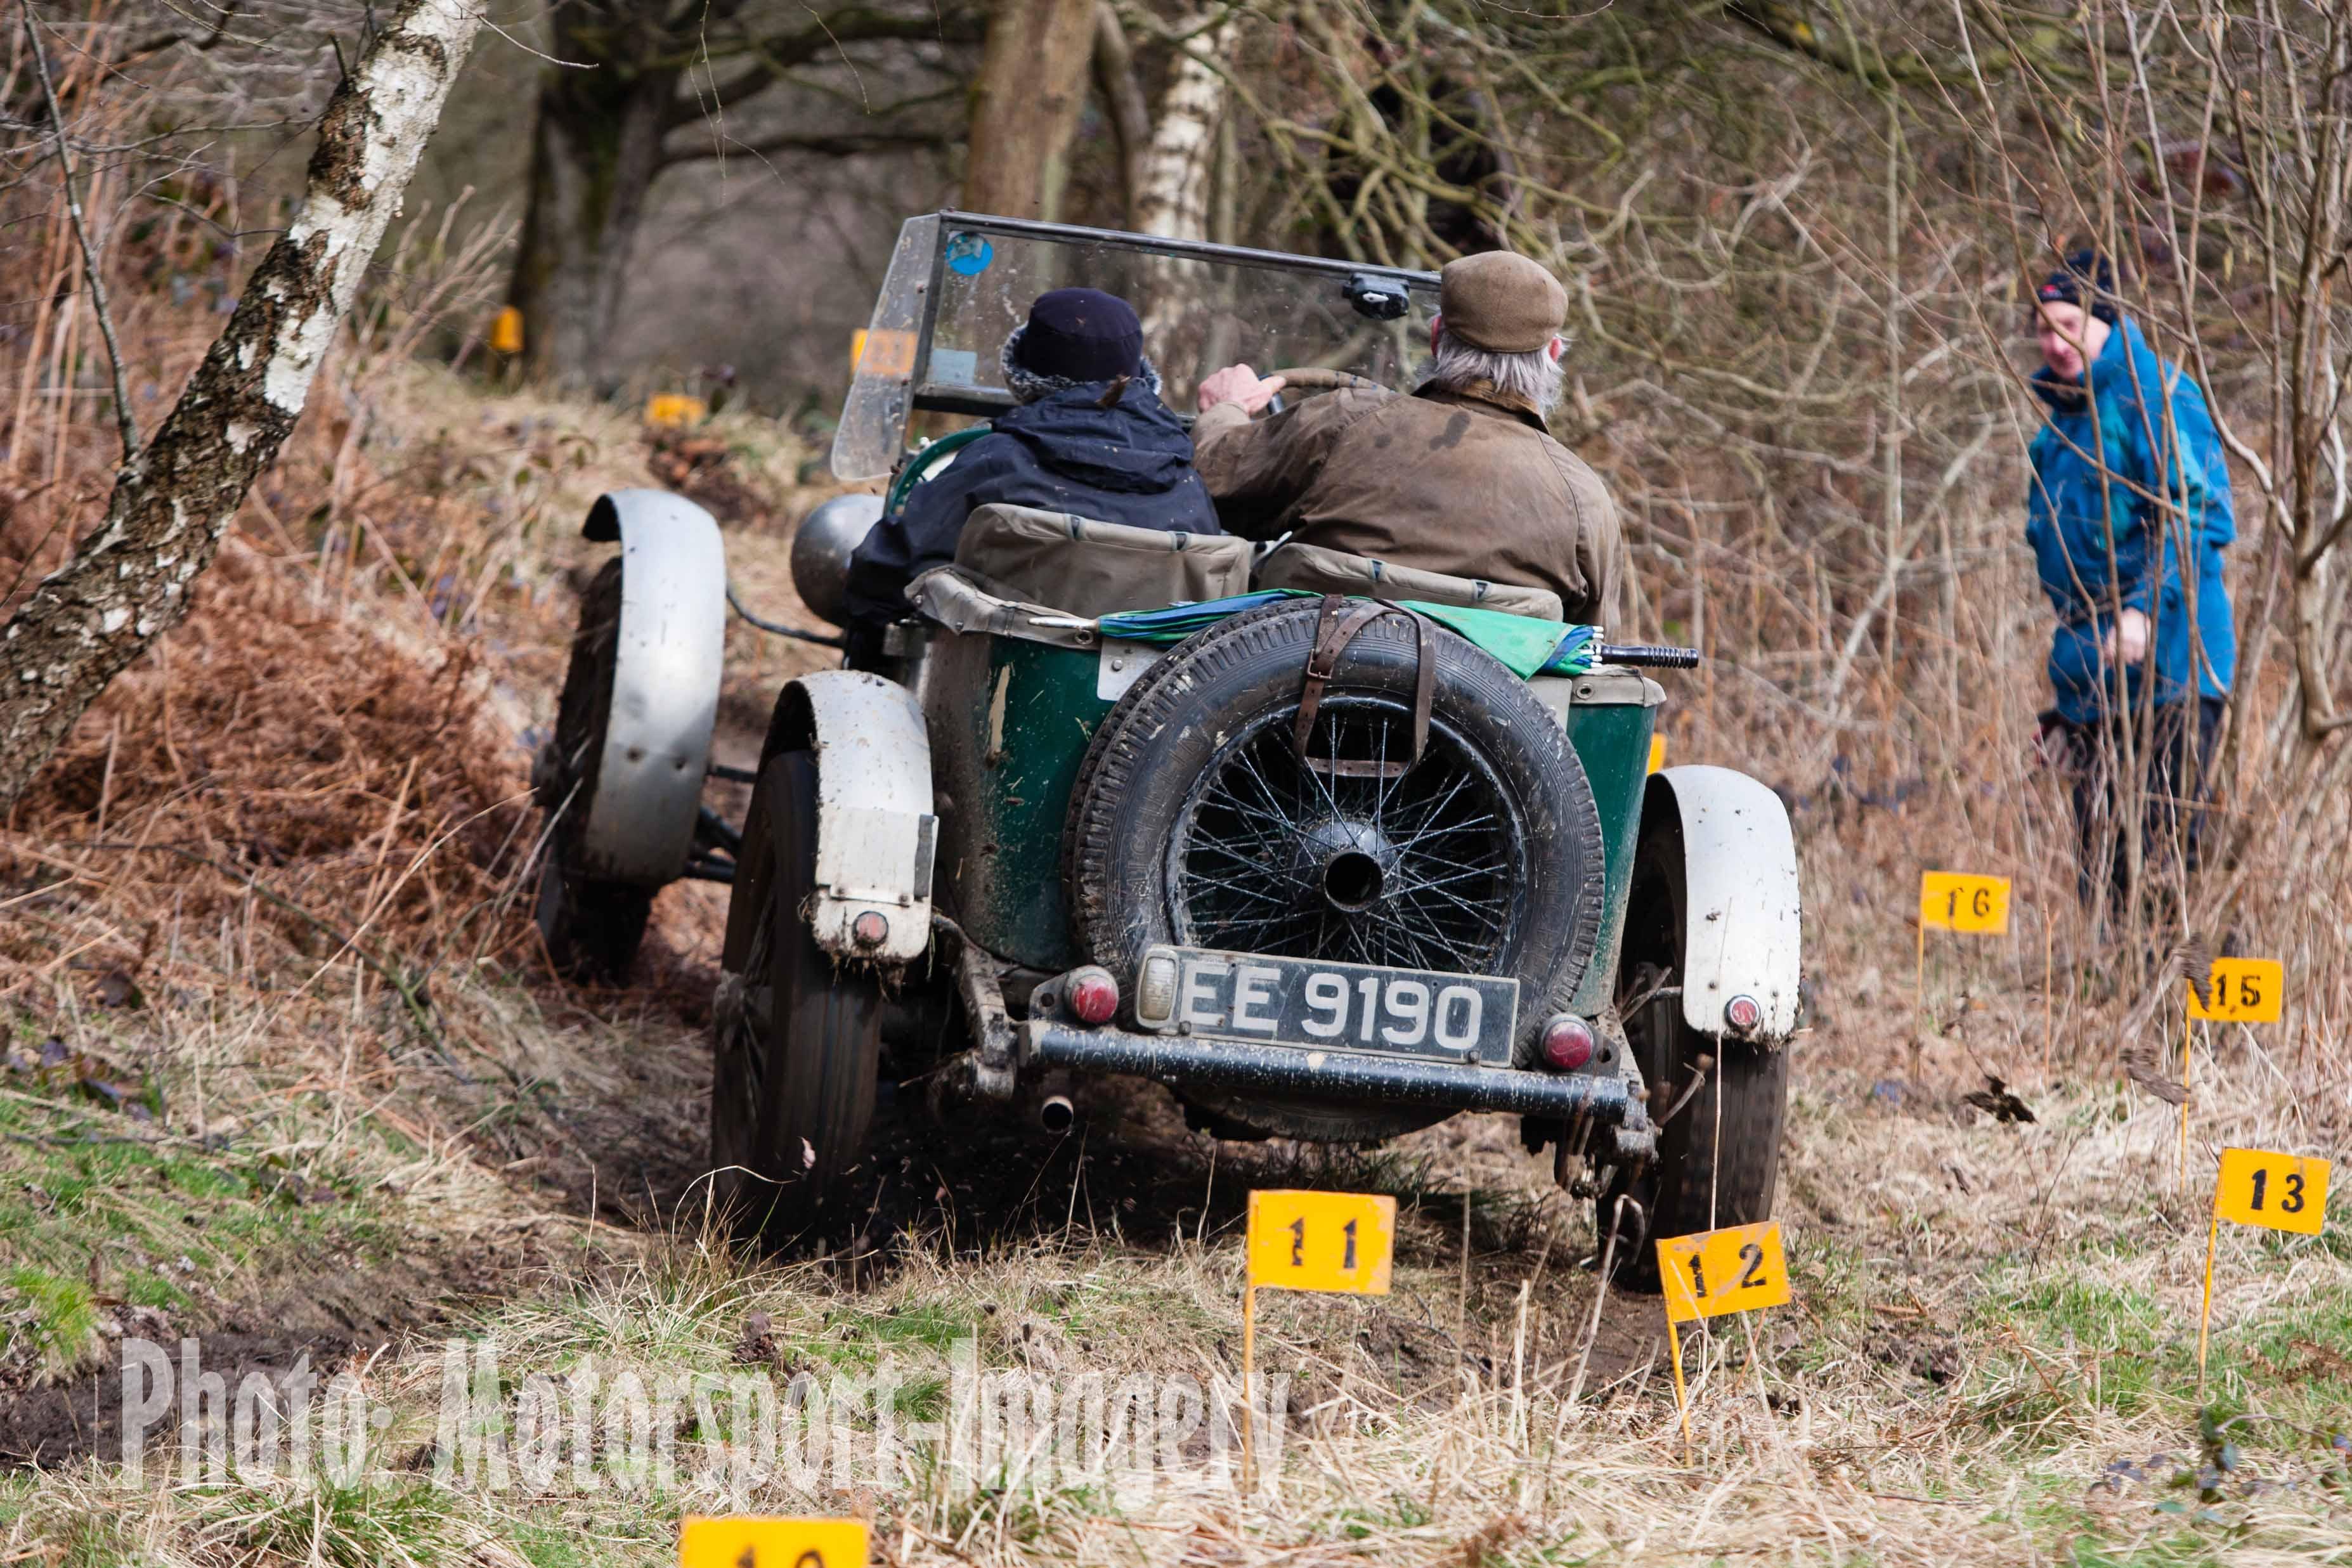 VSCC set for a 'Vintage' Weekend in Derbyshire cover